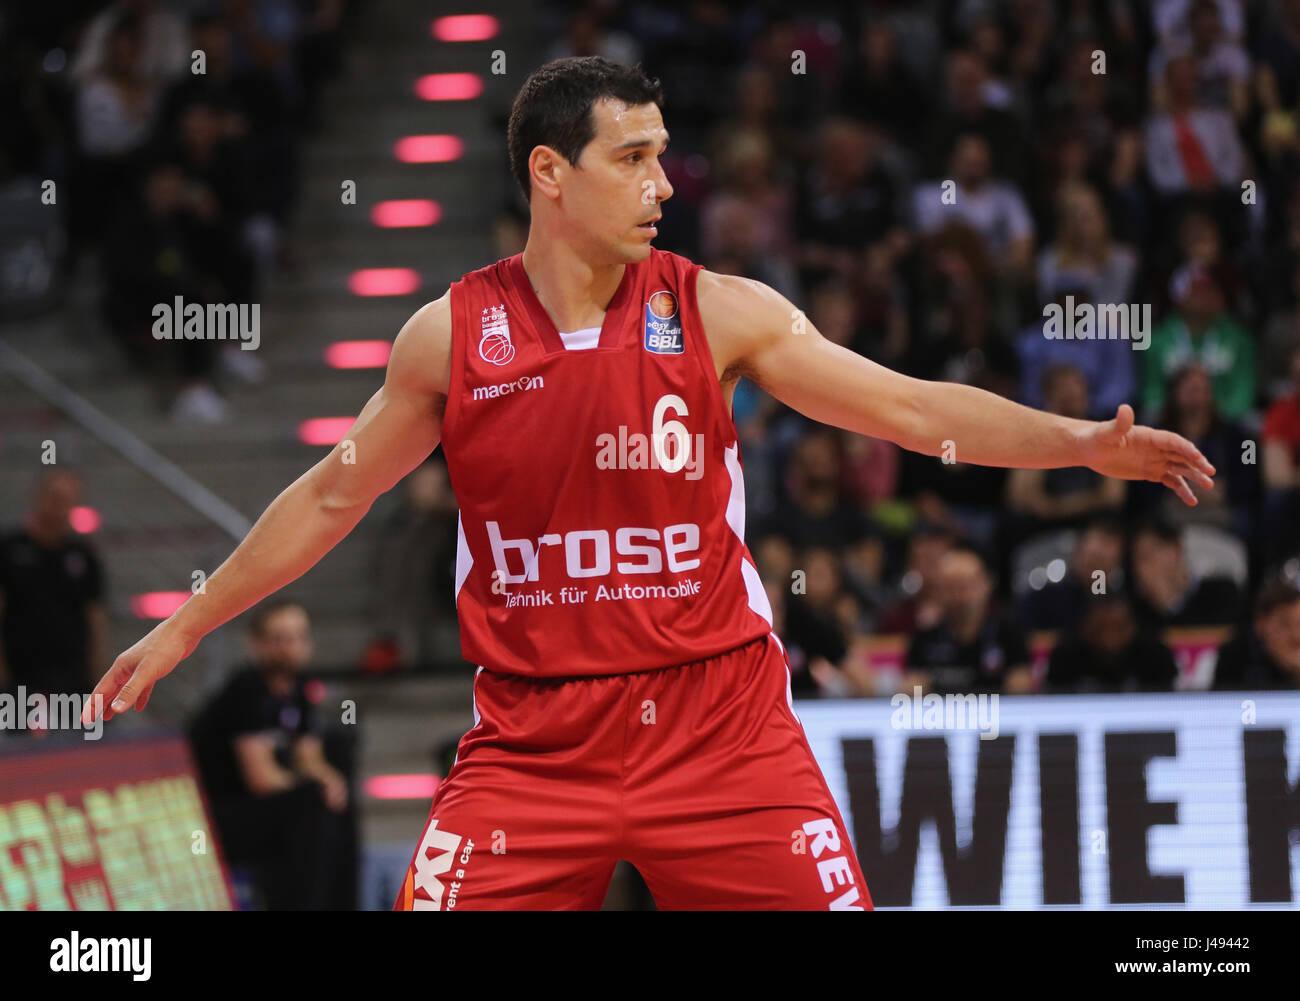 Bonn, Germany, 10th May 2017, basketball playoff, Telekom Baskets Bonn vs Brose Bamberg: Nikolaos Zisis (Bamberg). - Stock Image